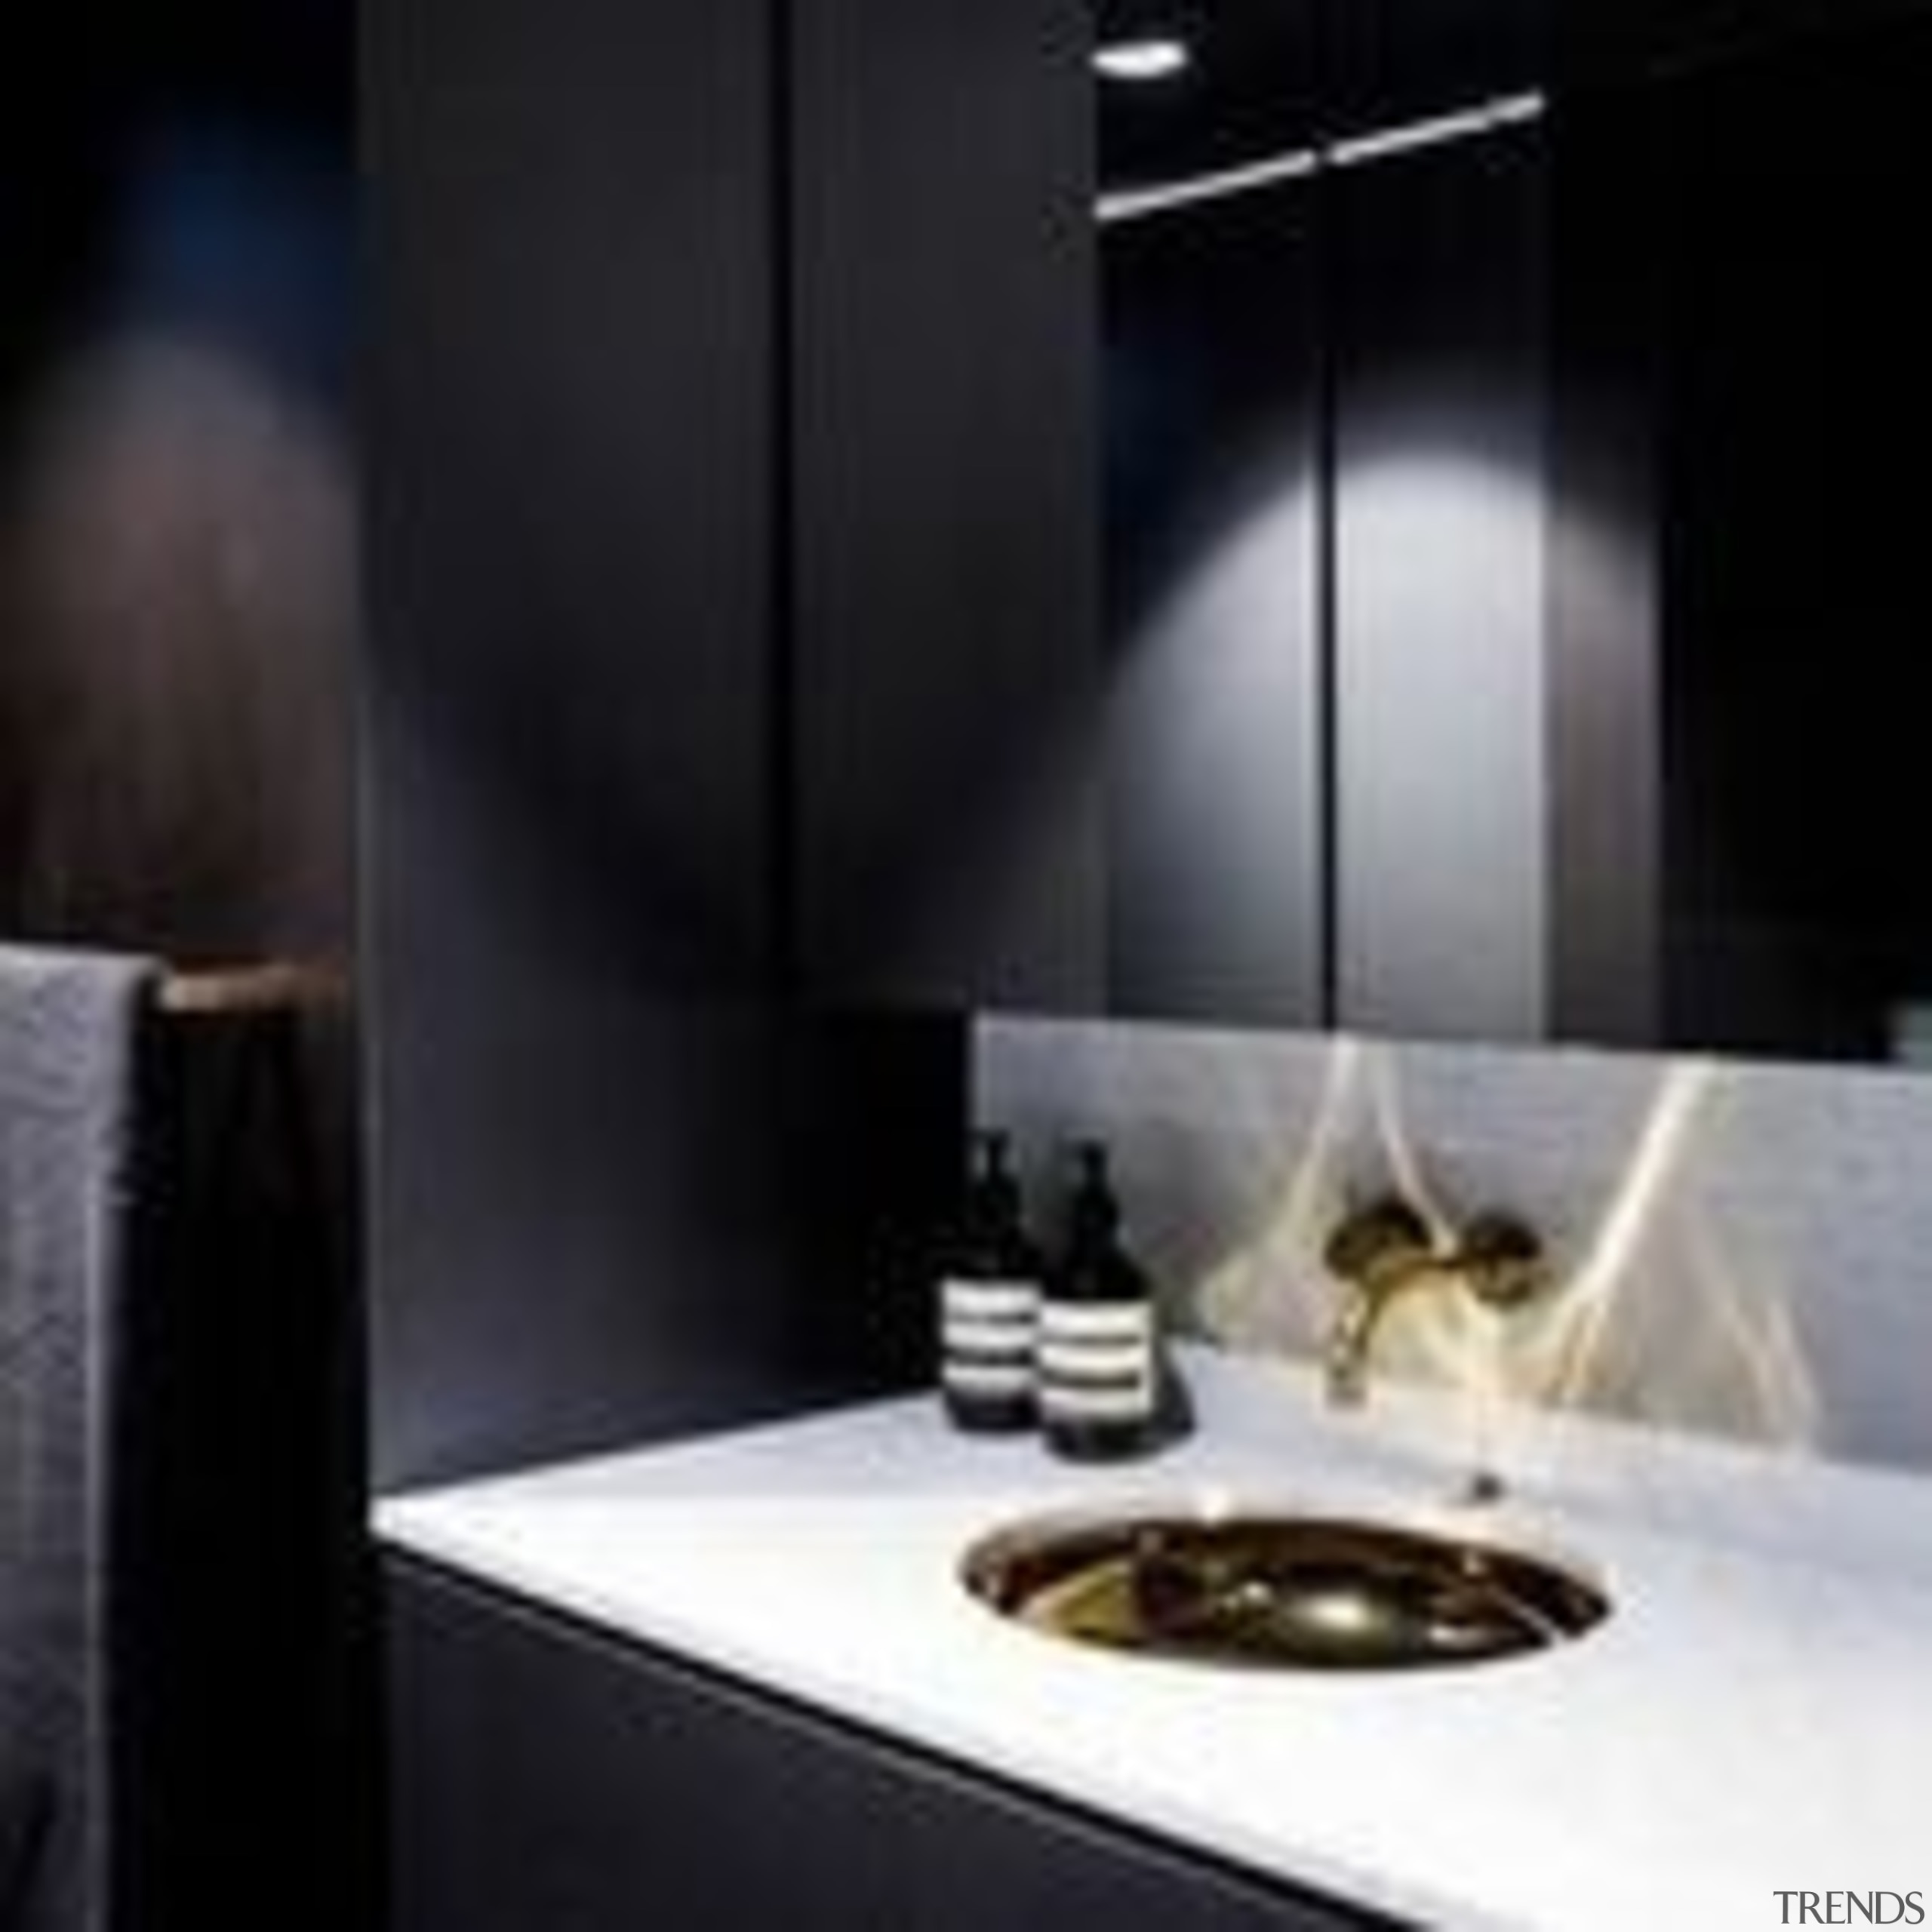 Architect: Architect Prinea - X - bathroom | bathroom, countertop, interior design, light fixture, lighting, product design, sink, tap, black